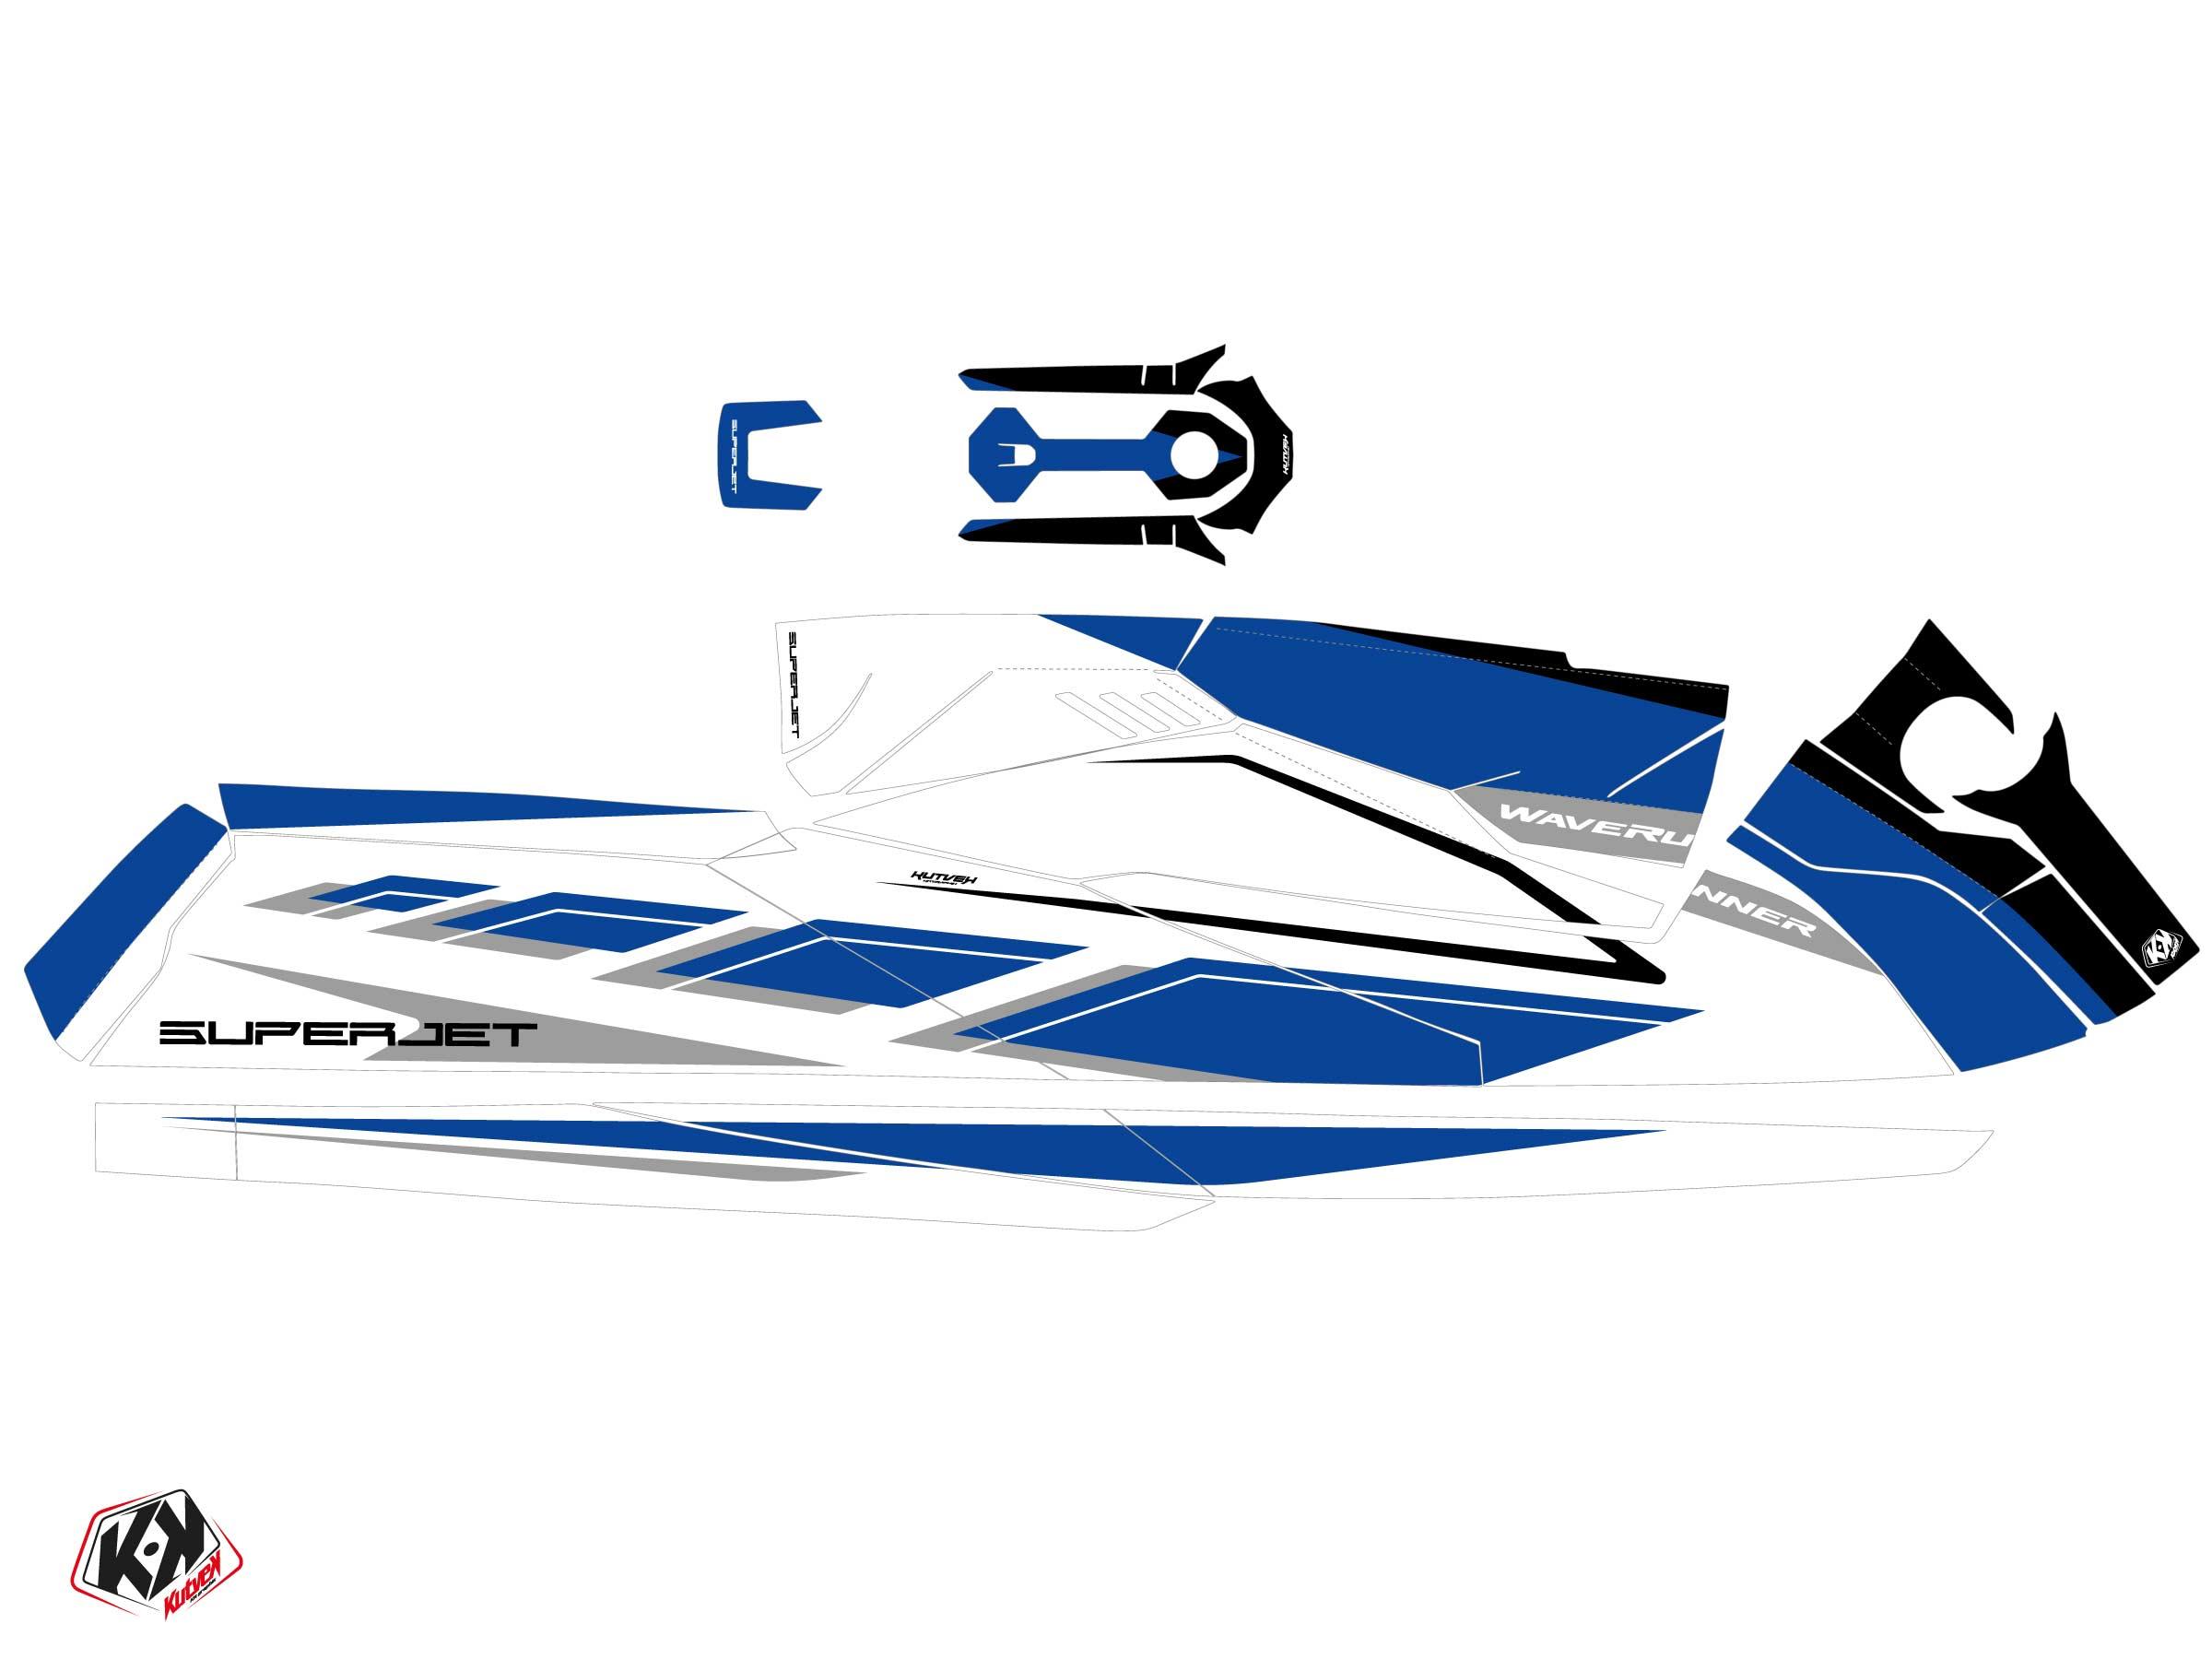 Yamaha Superjet 2021 Jet-Ski PERF Graphic Kit White